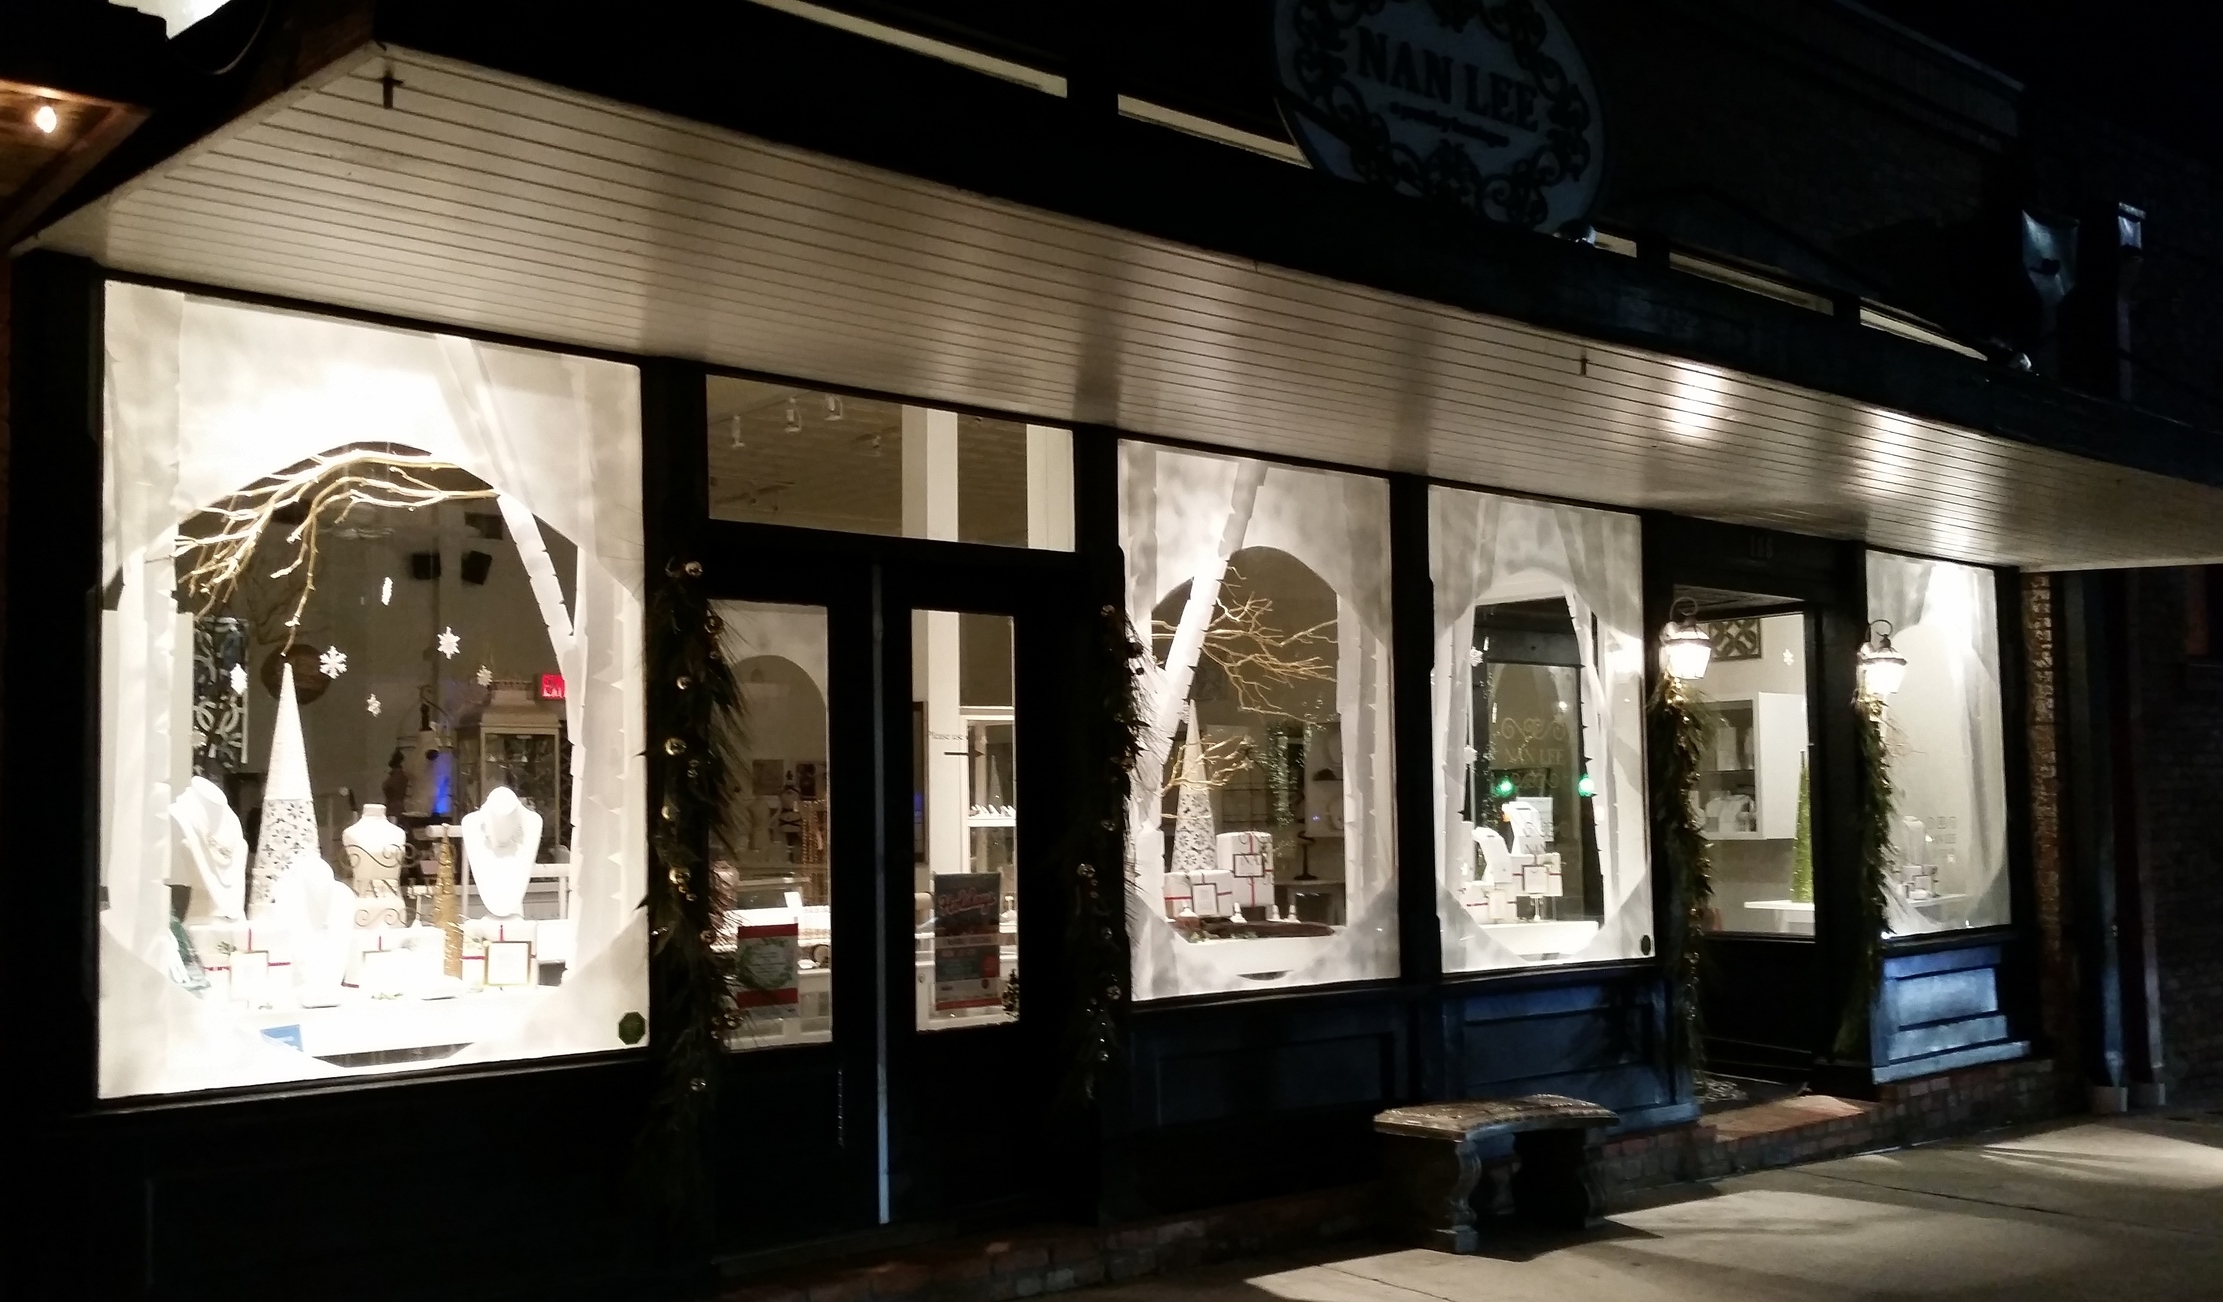 Holiday Windows at Nan Lee Jewelry 2015